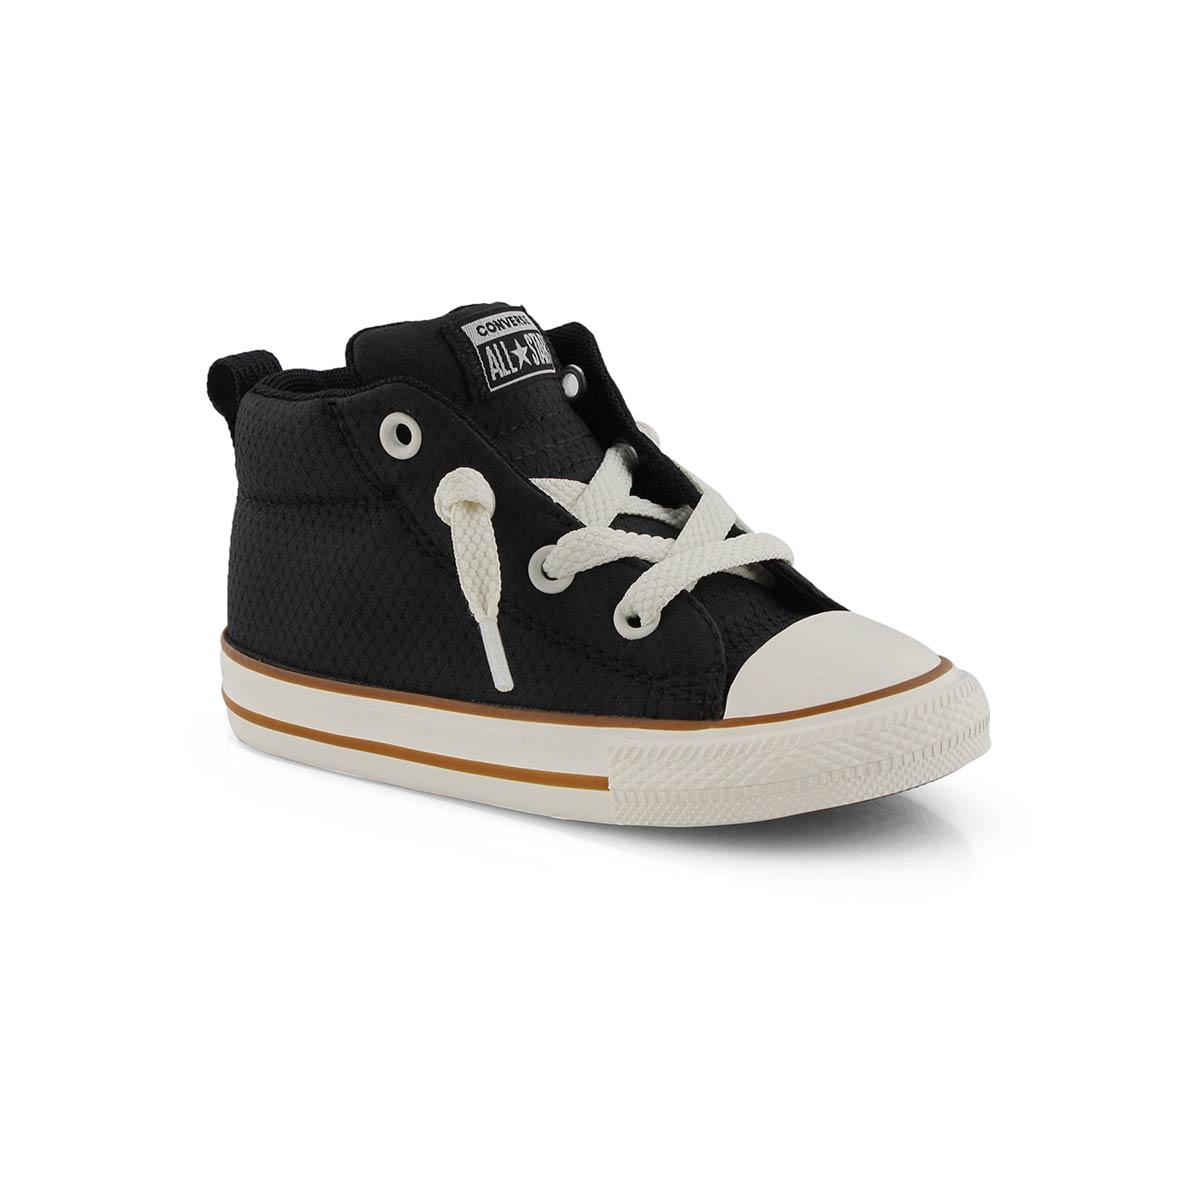 Inf-b CTAS Street Mid blk/gum sneaker